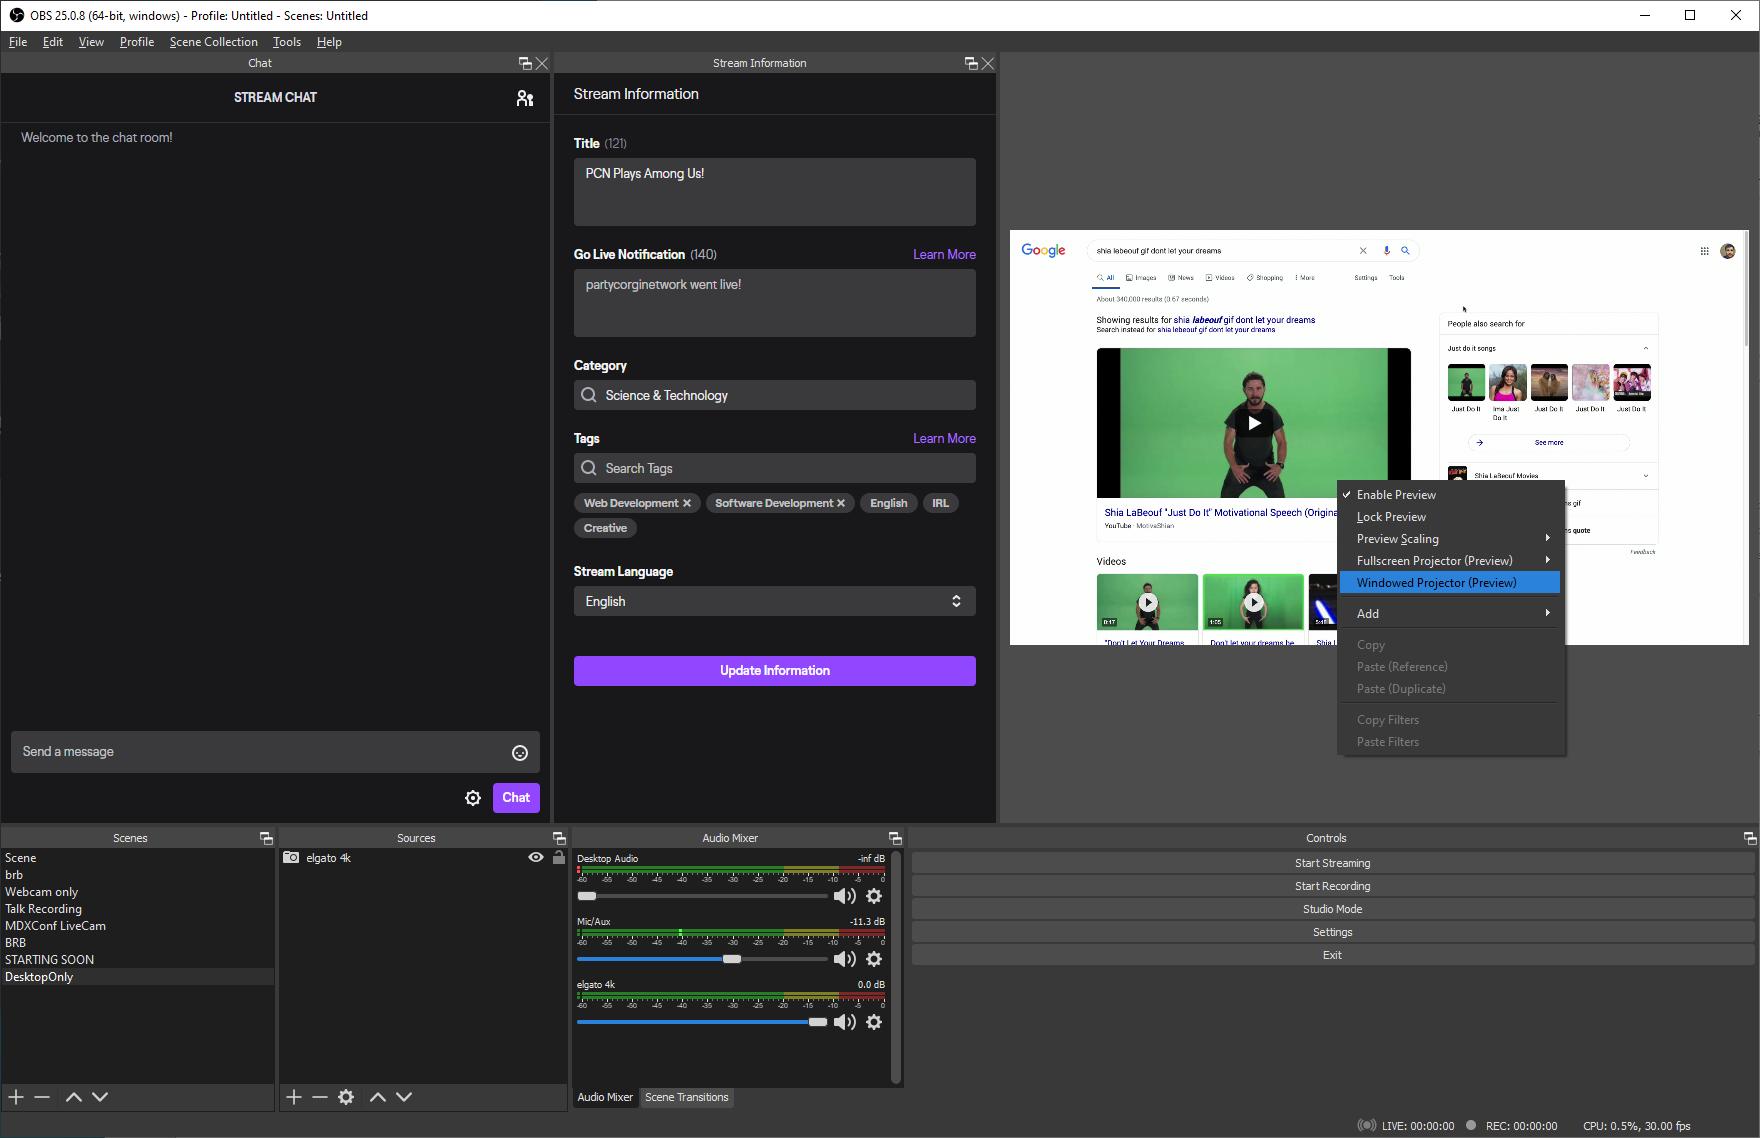 OBS window projector right click menu option